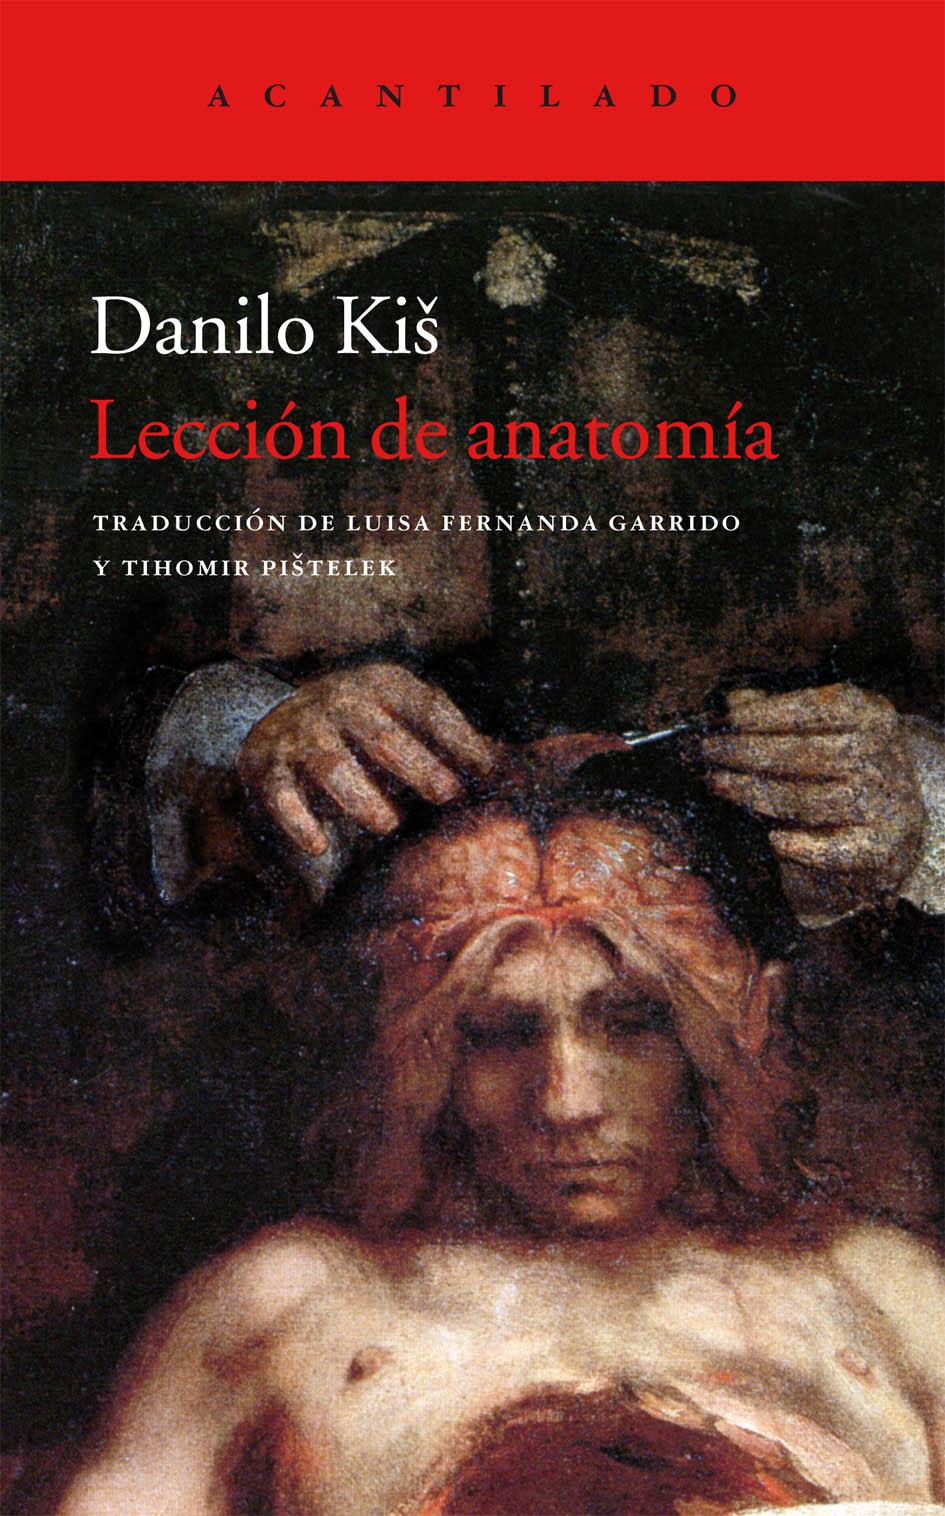 Lección de anatomía   Editorial Acantilado